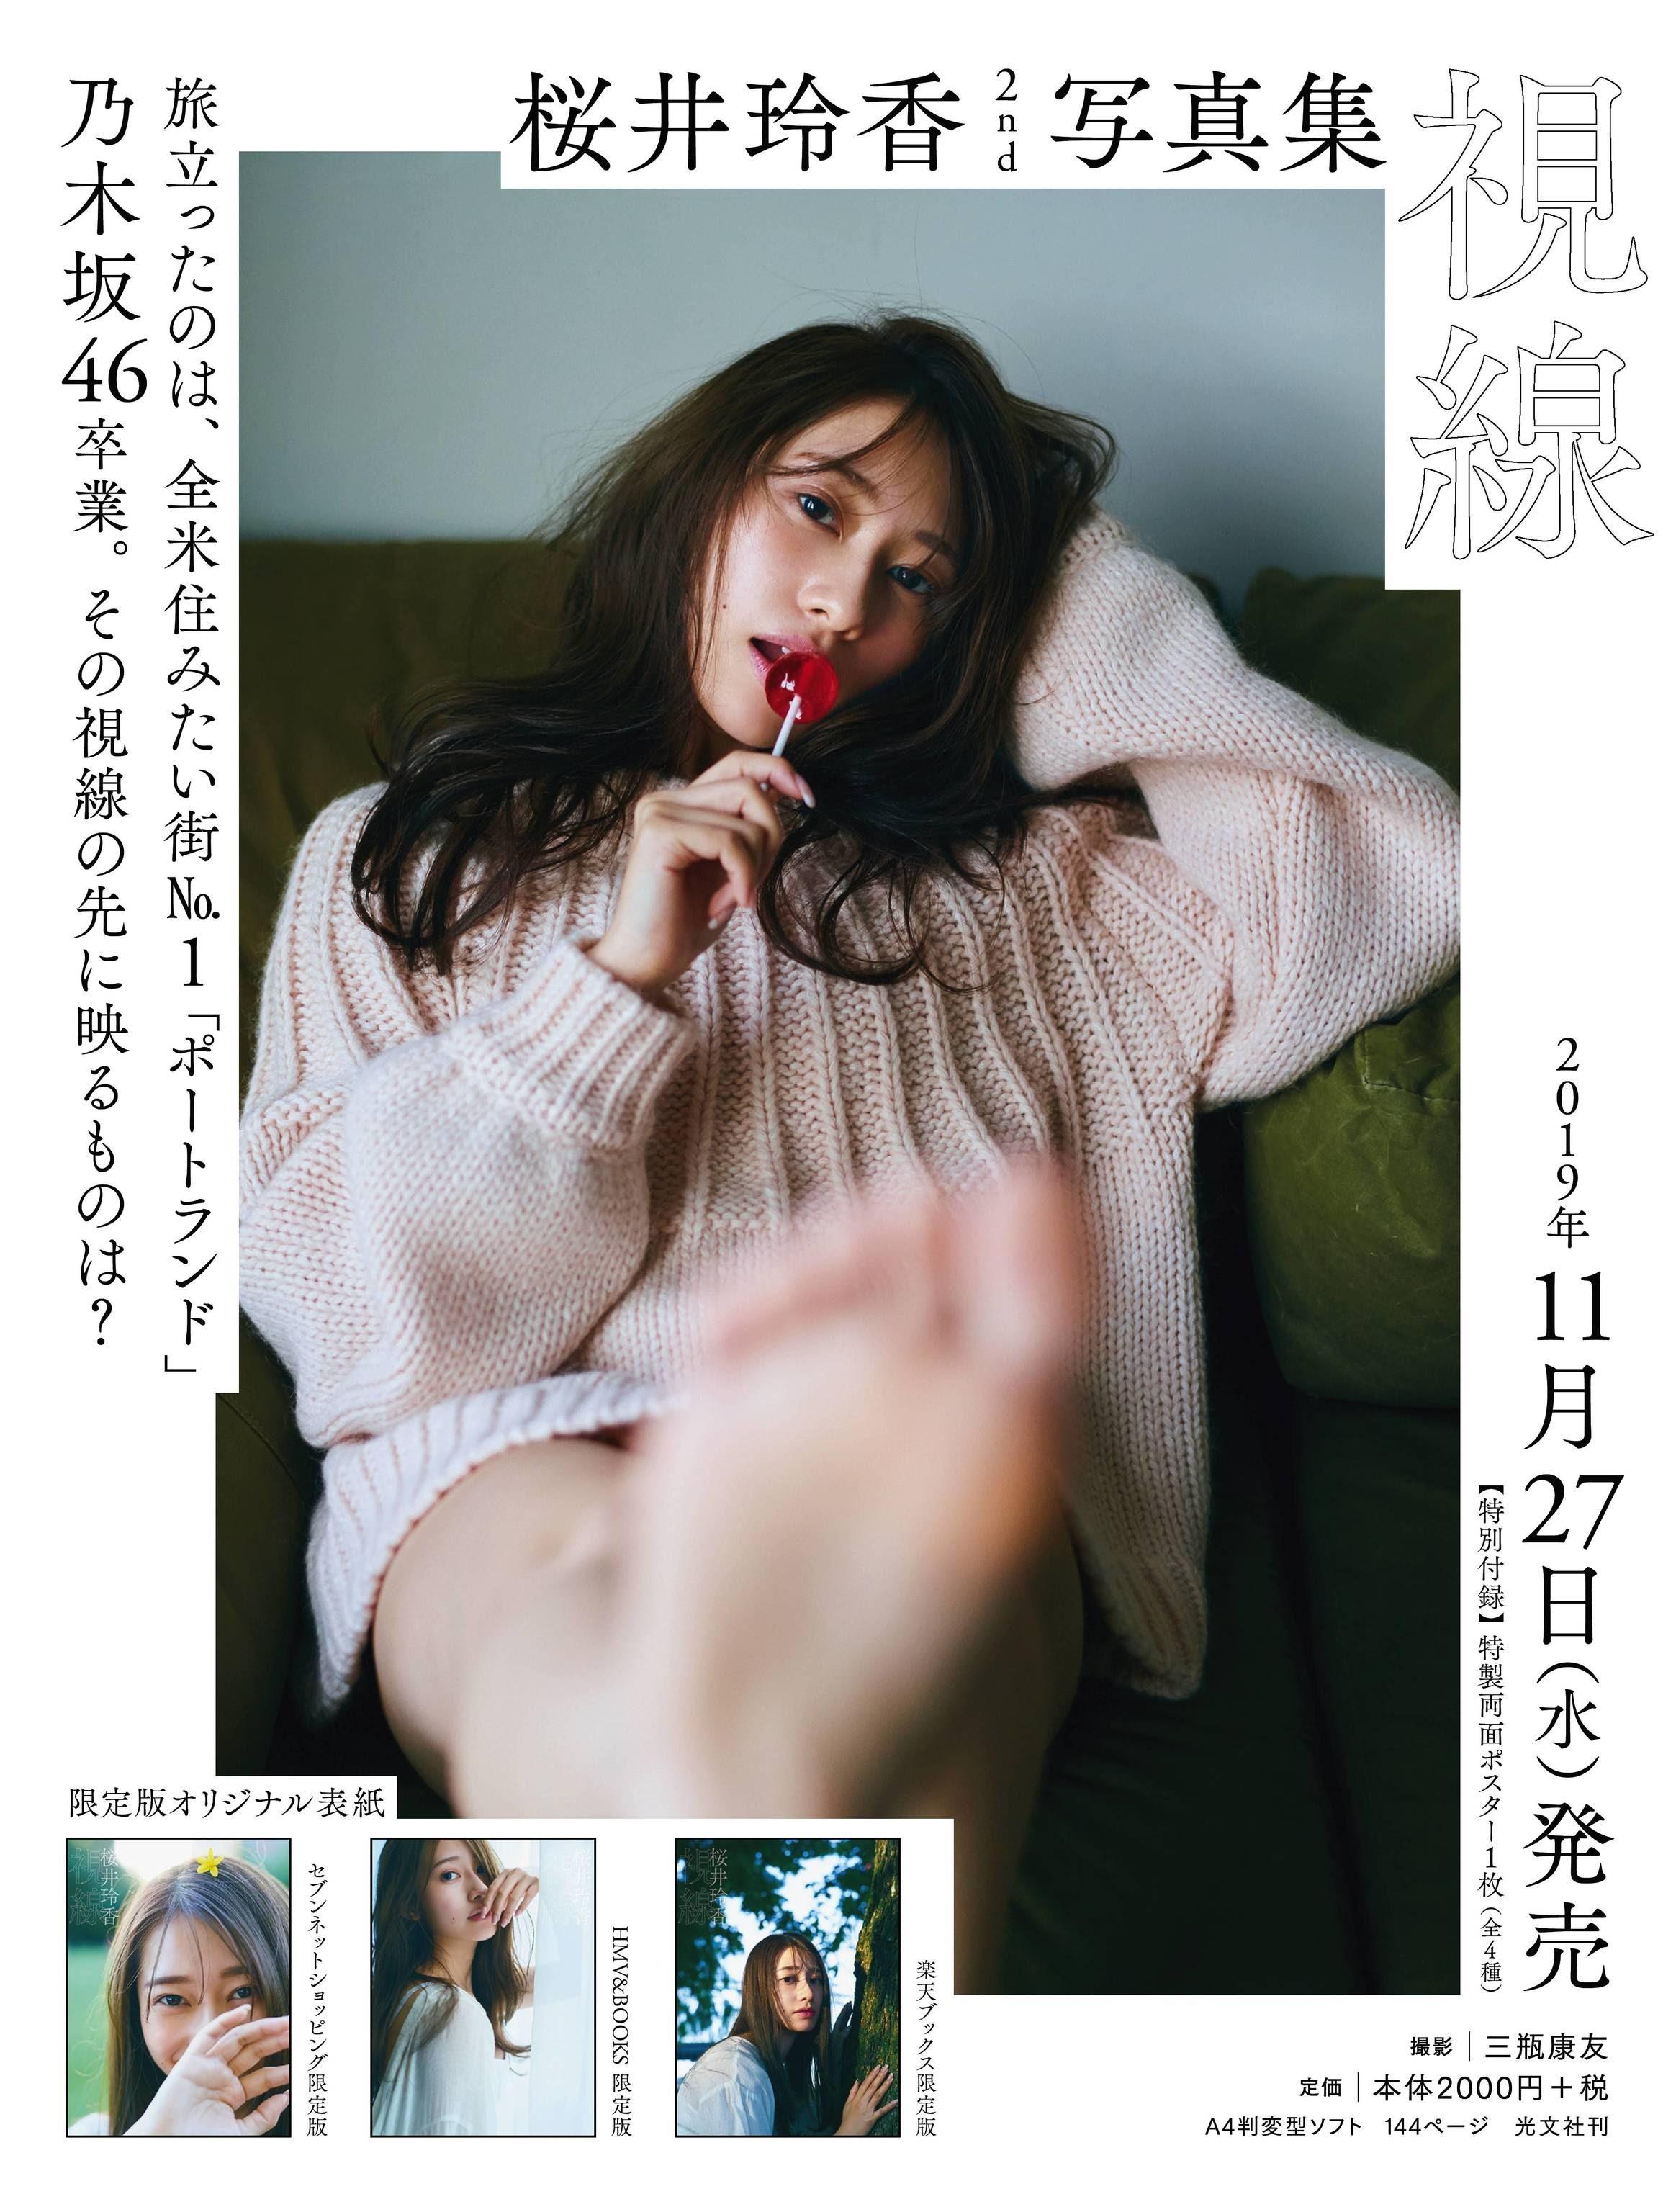 12-Reika Sakurai (1)